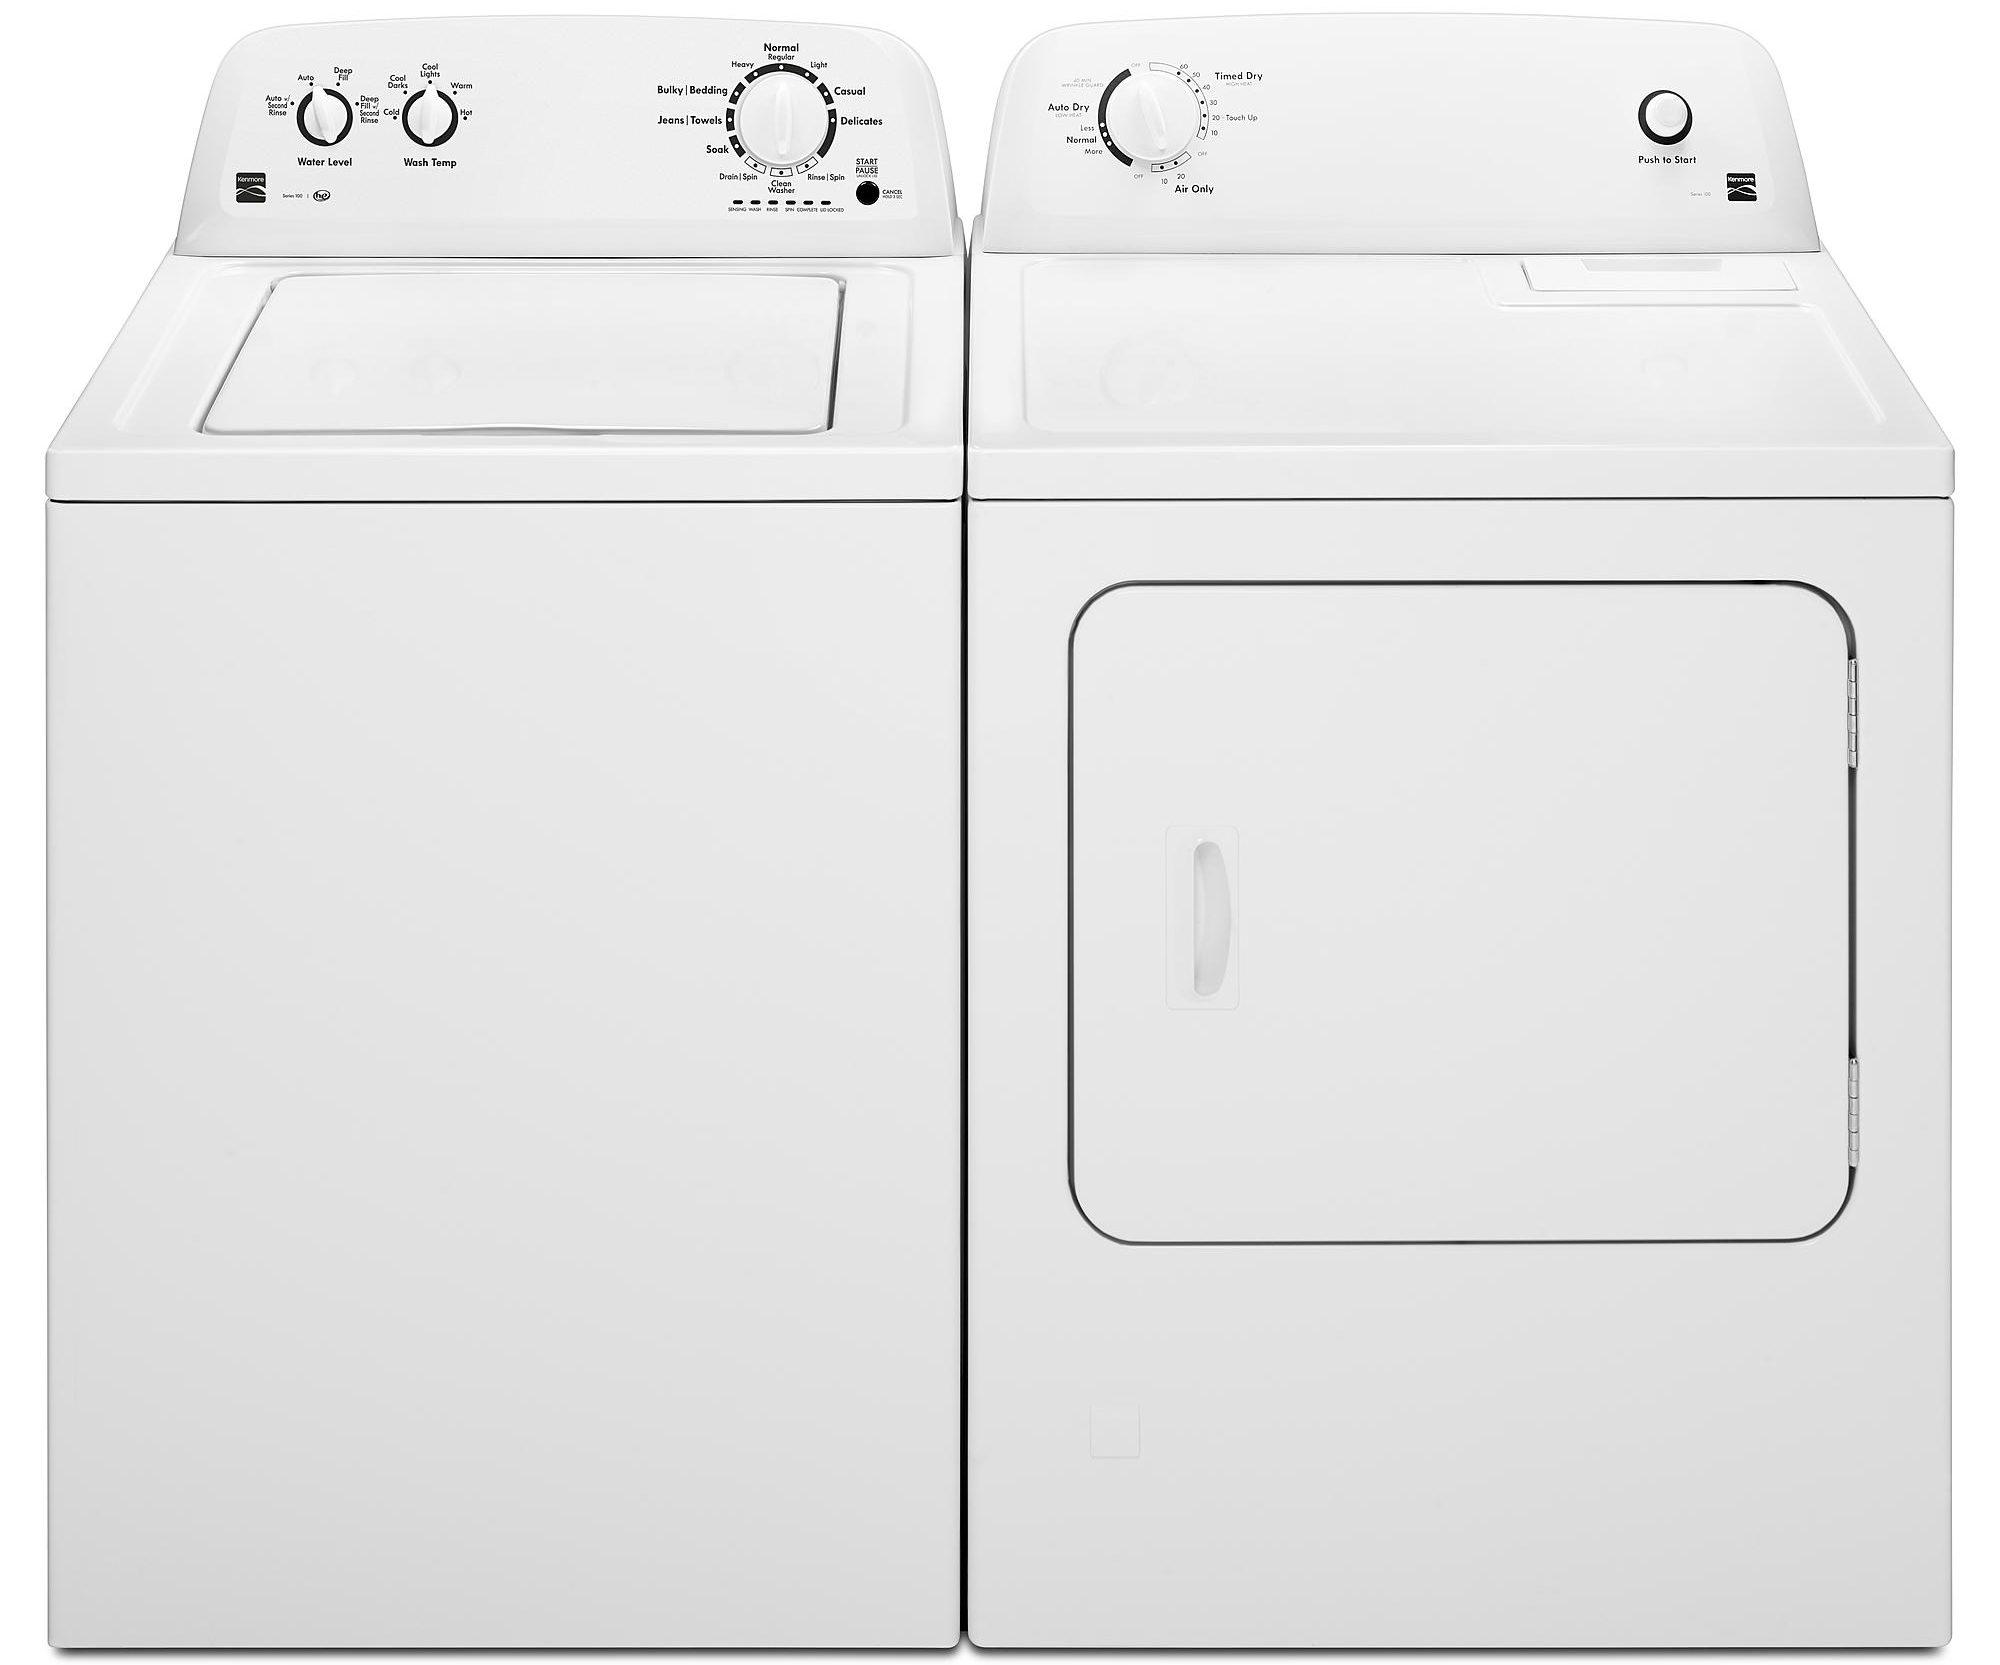 Kenmore Washer Amp Dryer Only 686 86 Delivered Regularly